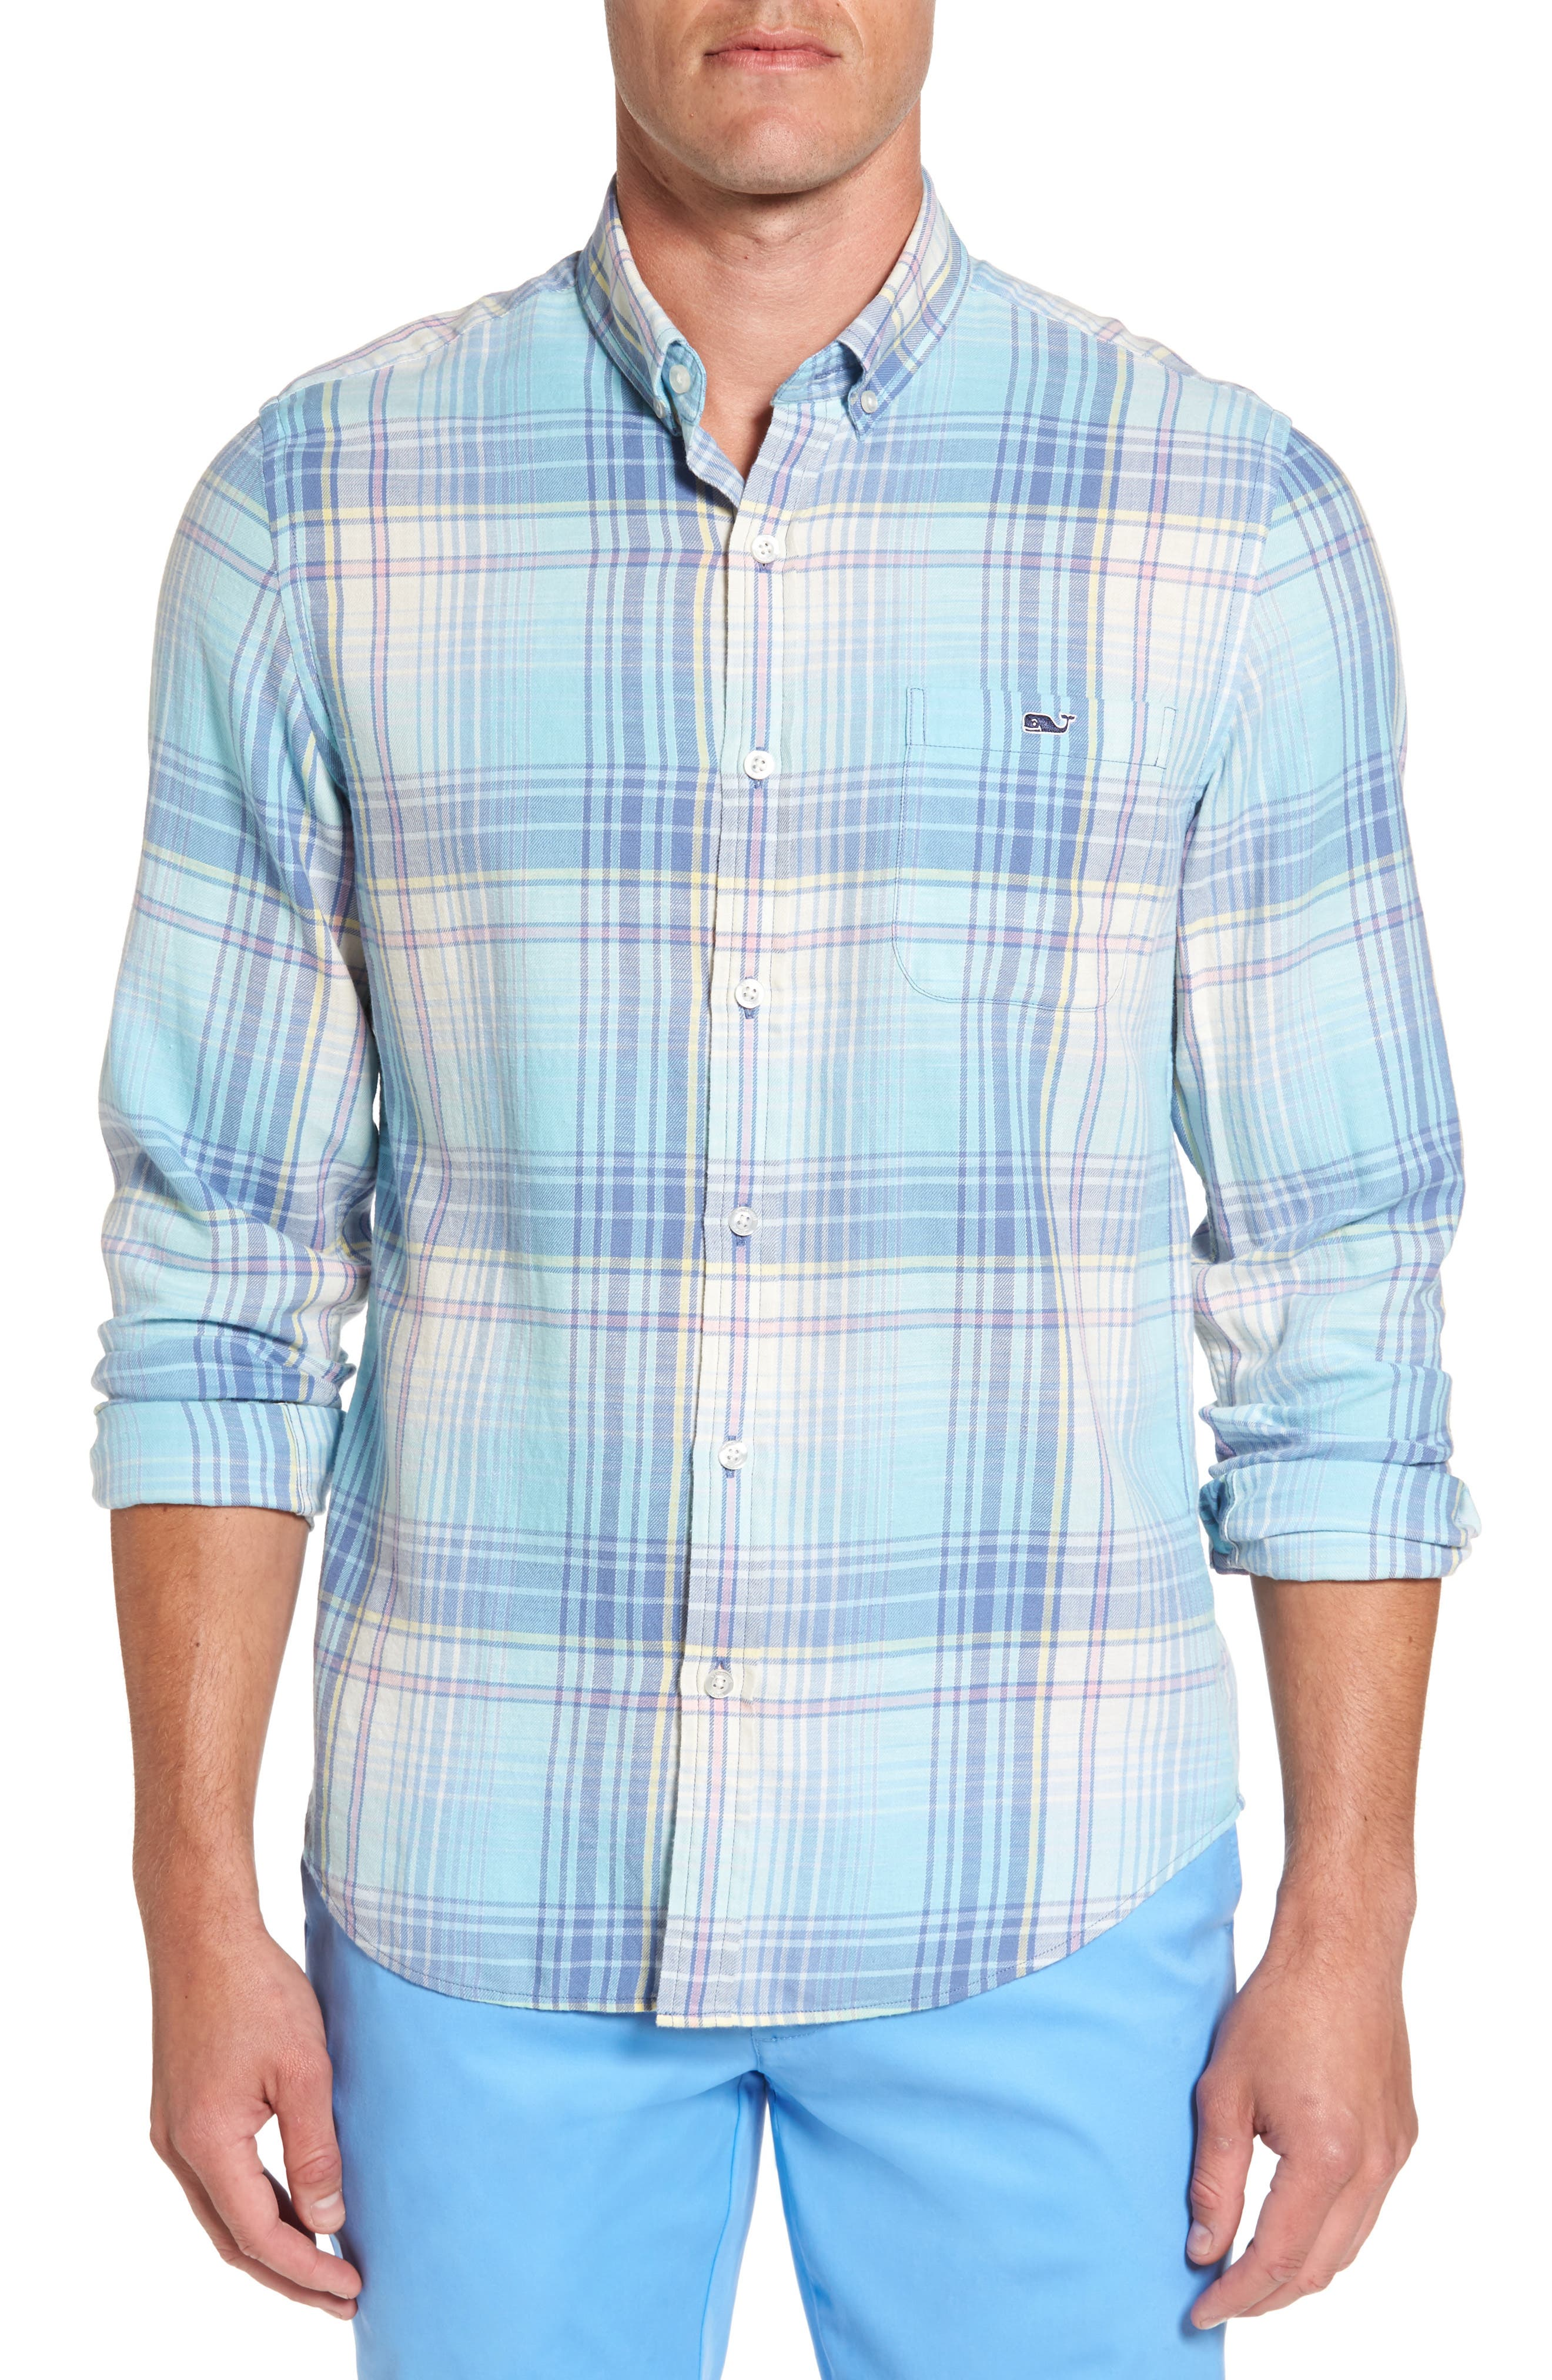 Main Image - vineyard vines Pequot Plaid Slim Fit Tucker Sport Shirt